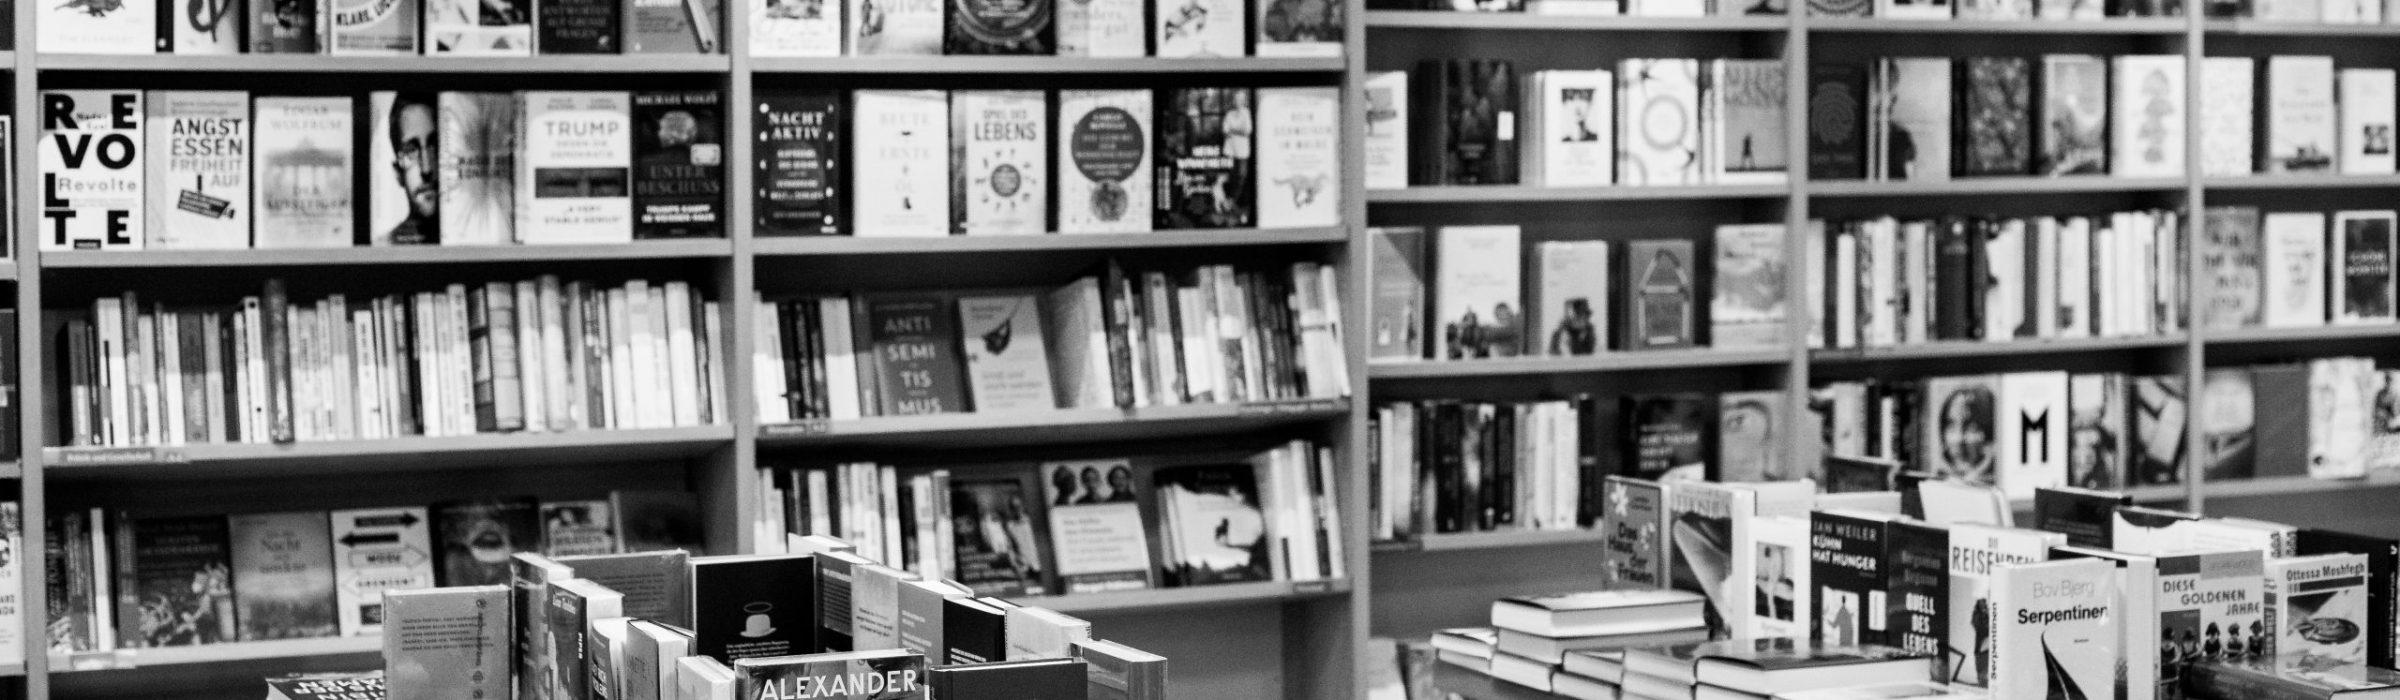 Über uns Parkbuchhandlung Buchhandlung Bonn Bad Godesberg